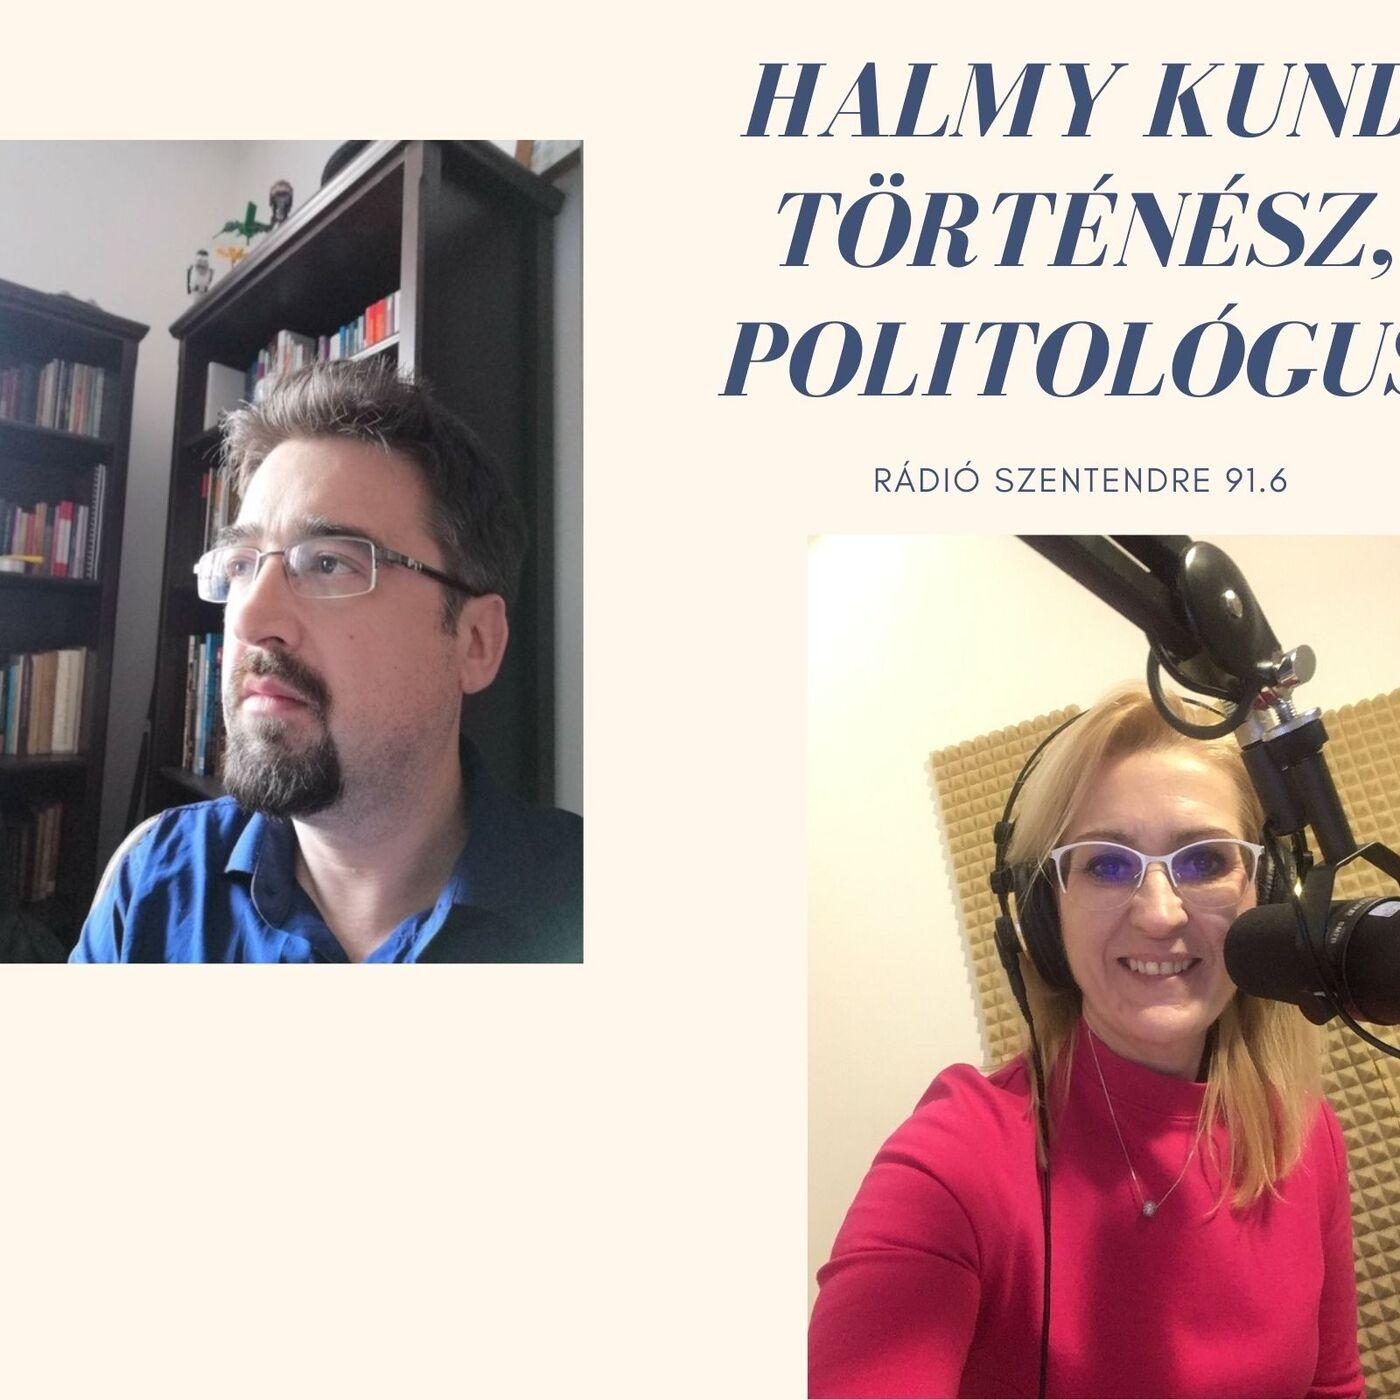 Halmy Kund történész, politológus